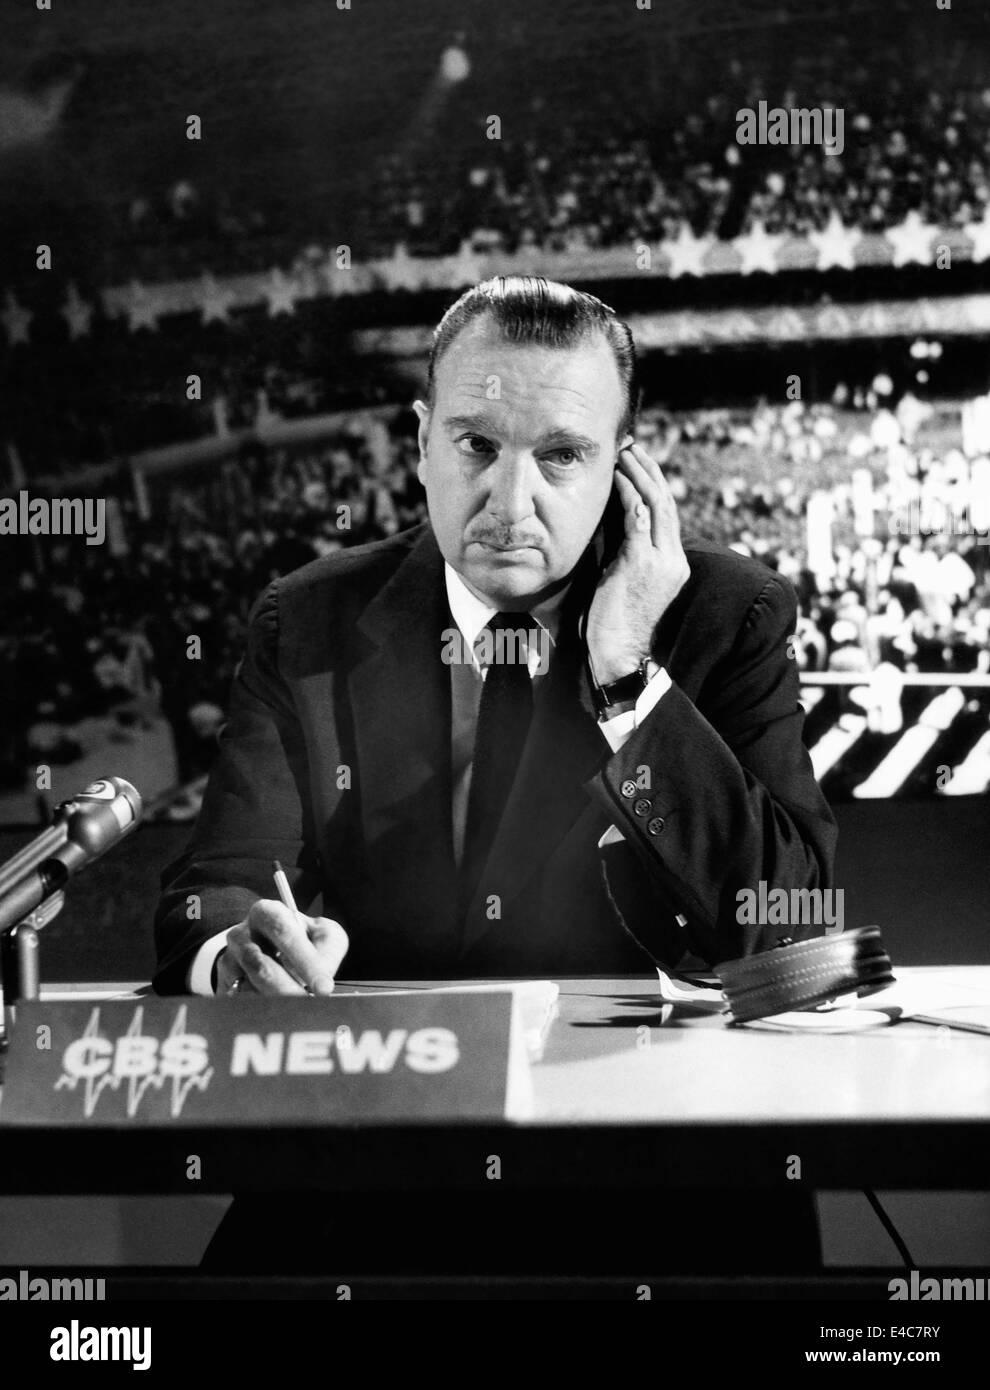 Walter Cronkite, American Journalist, 1968 - Stock Image